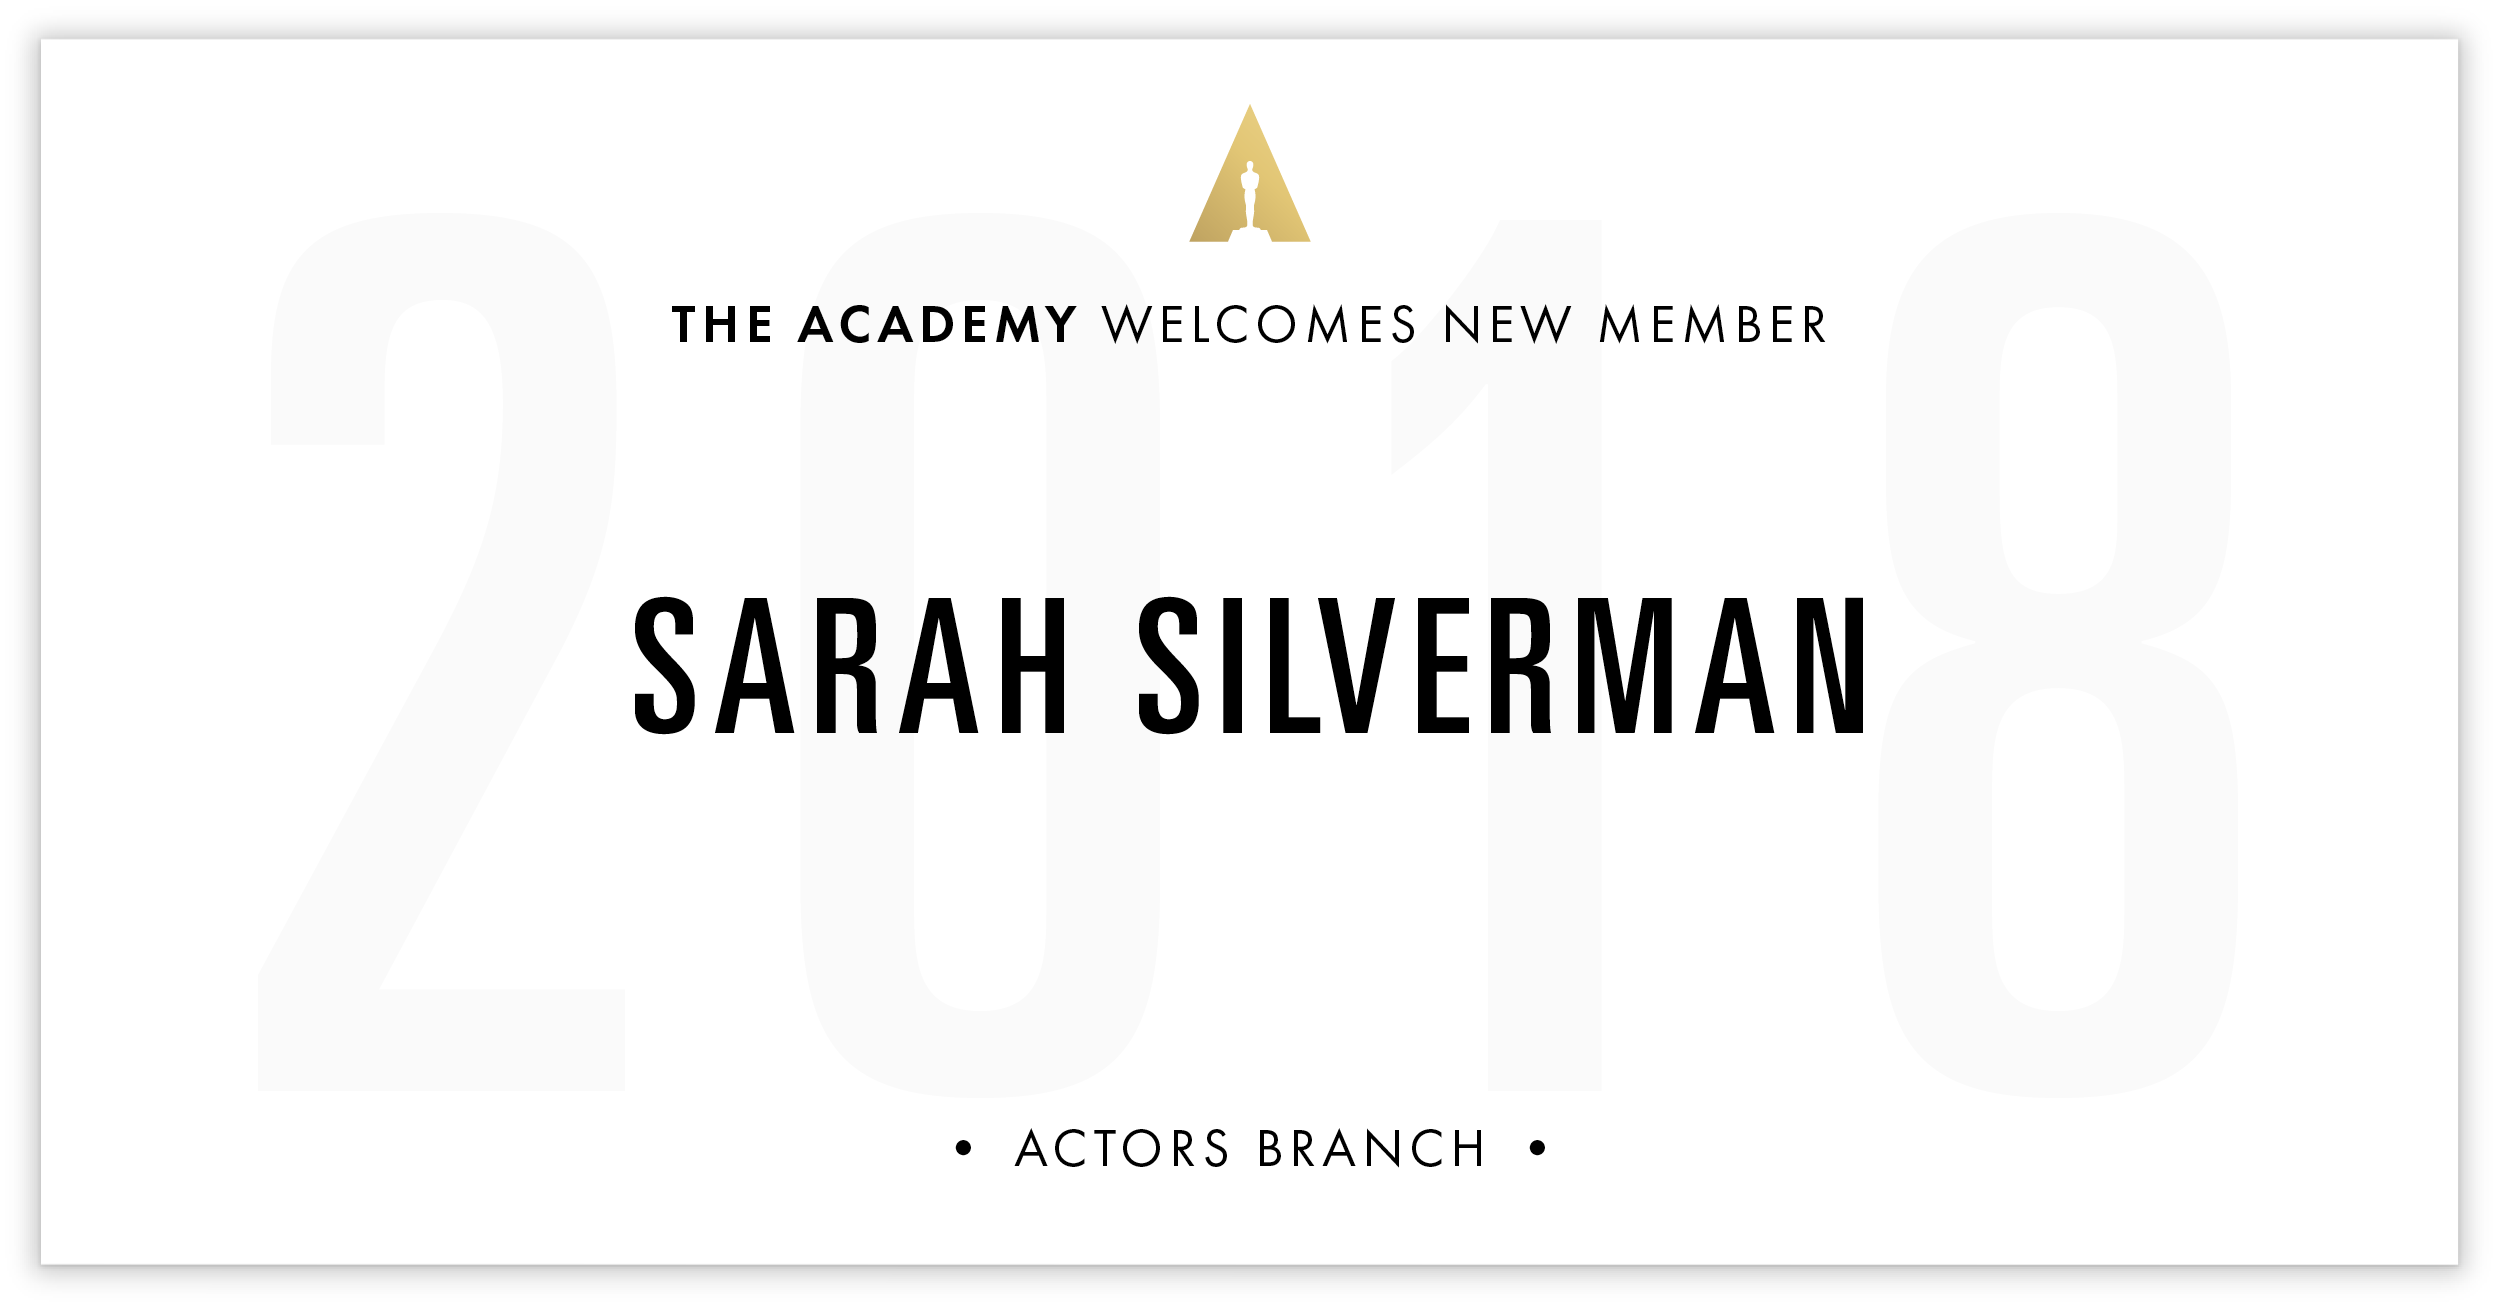 Sarah Silverman is invited!